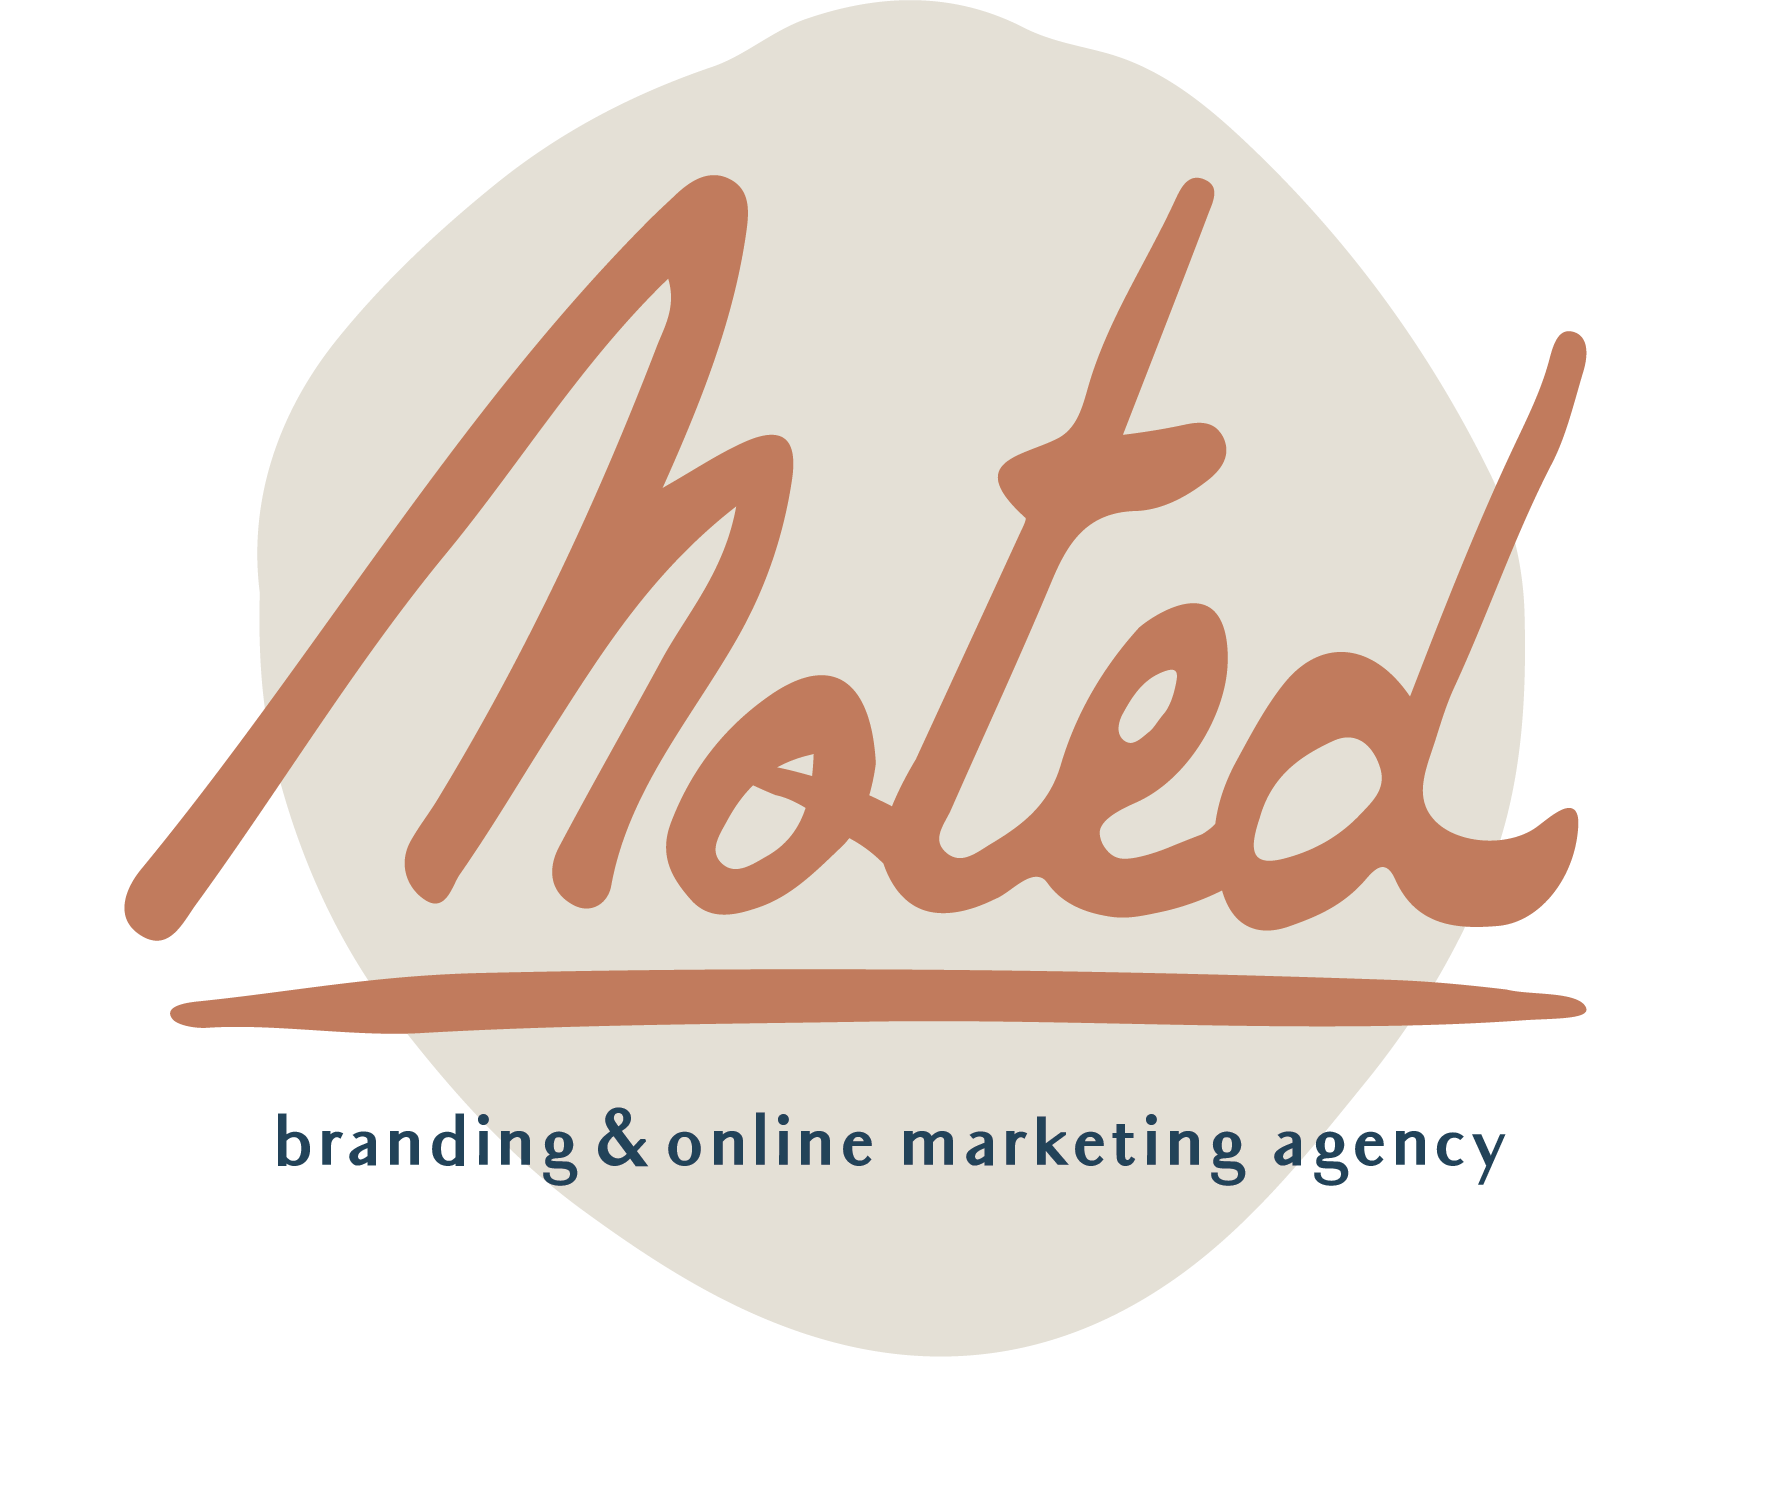 Noted branding & online marketing agency